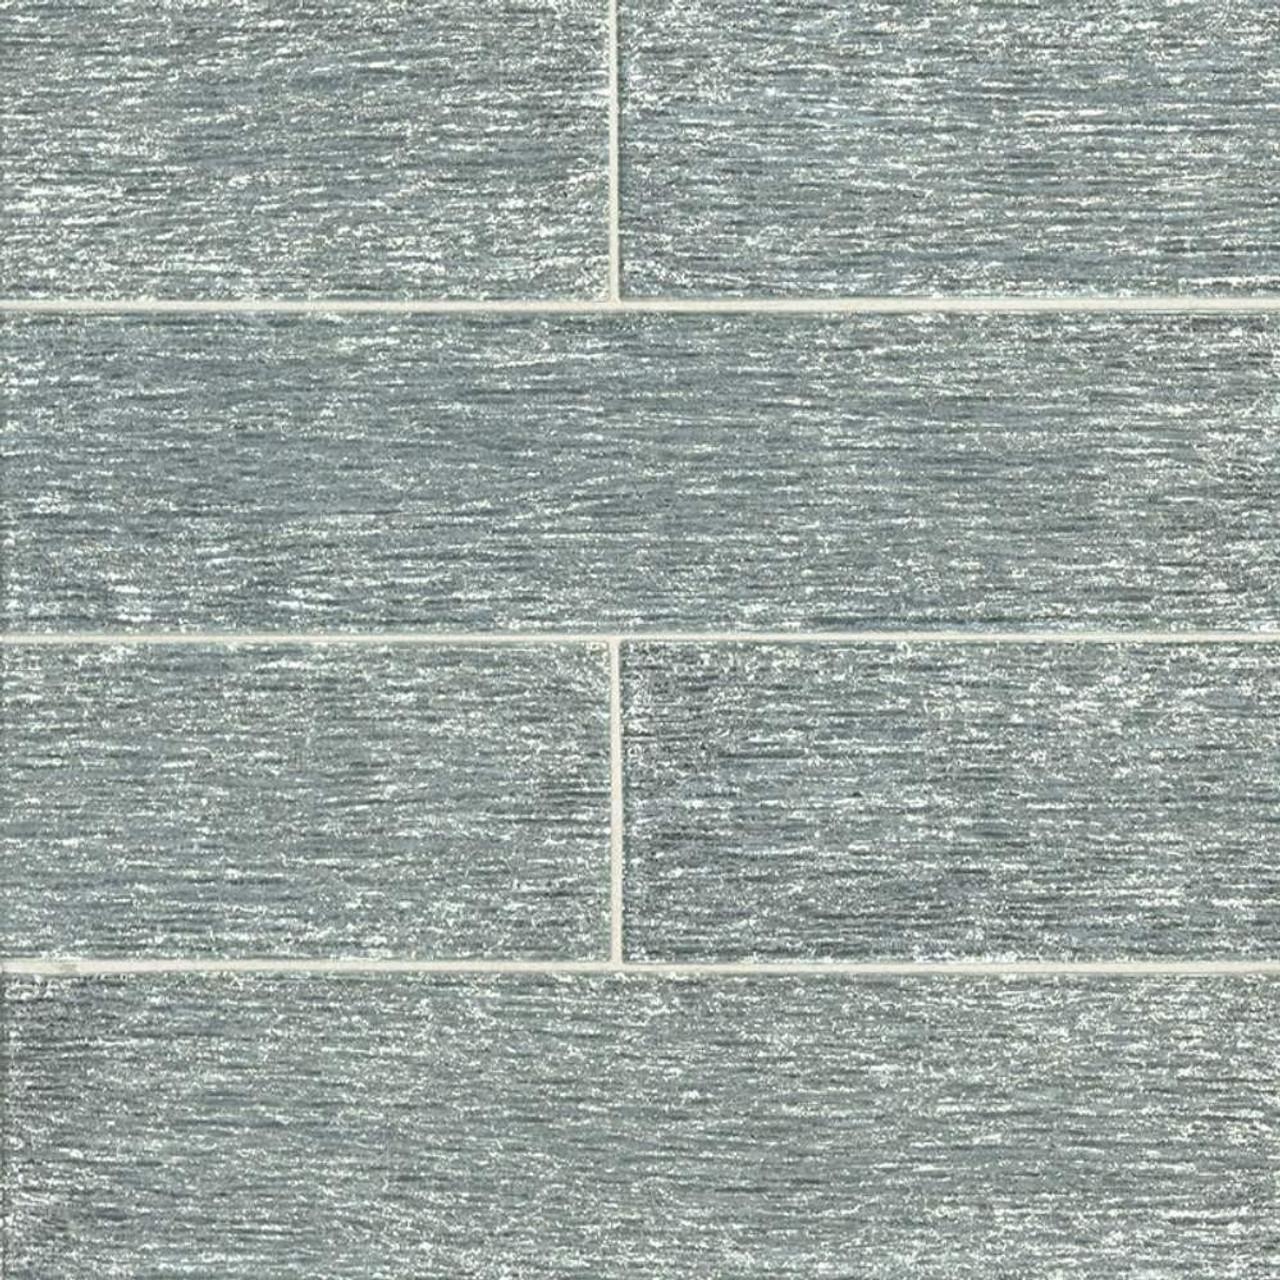 ms international backsplash series chilcott bright glossy 3x12 glass subway tile smot gl t chibri312